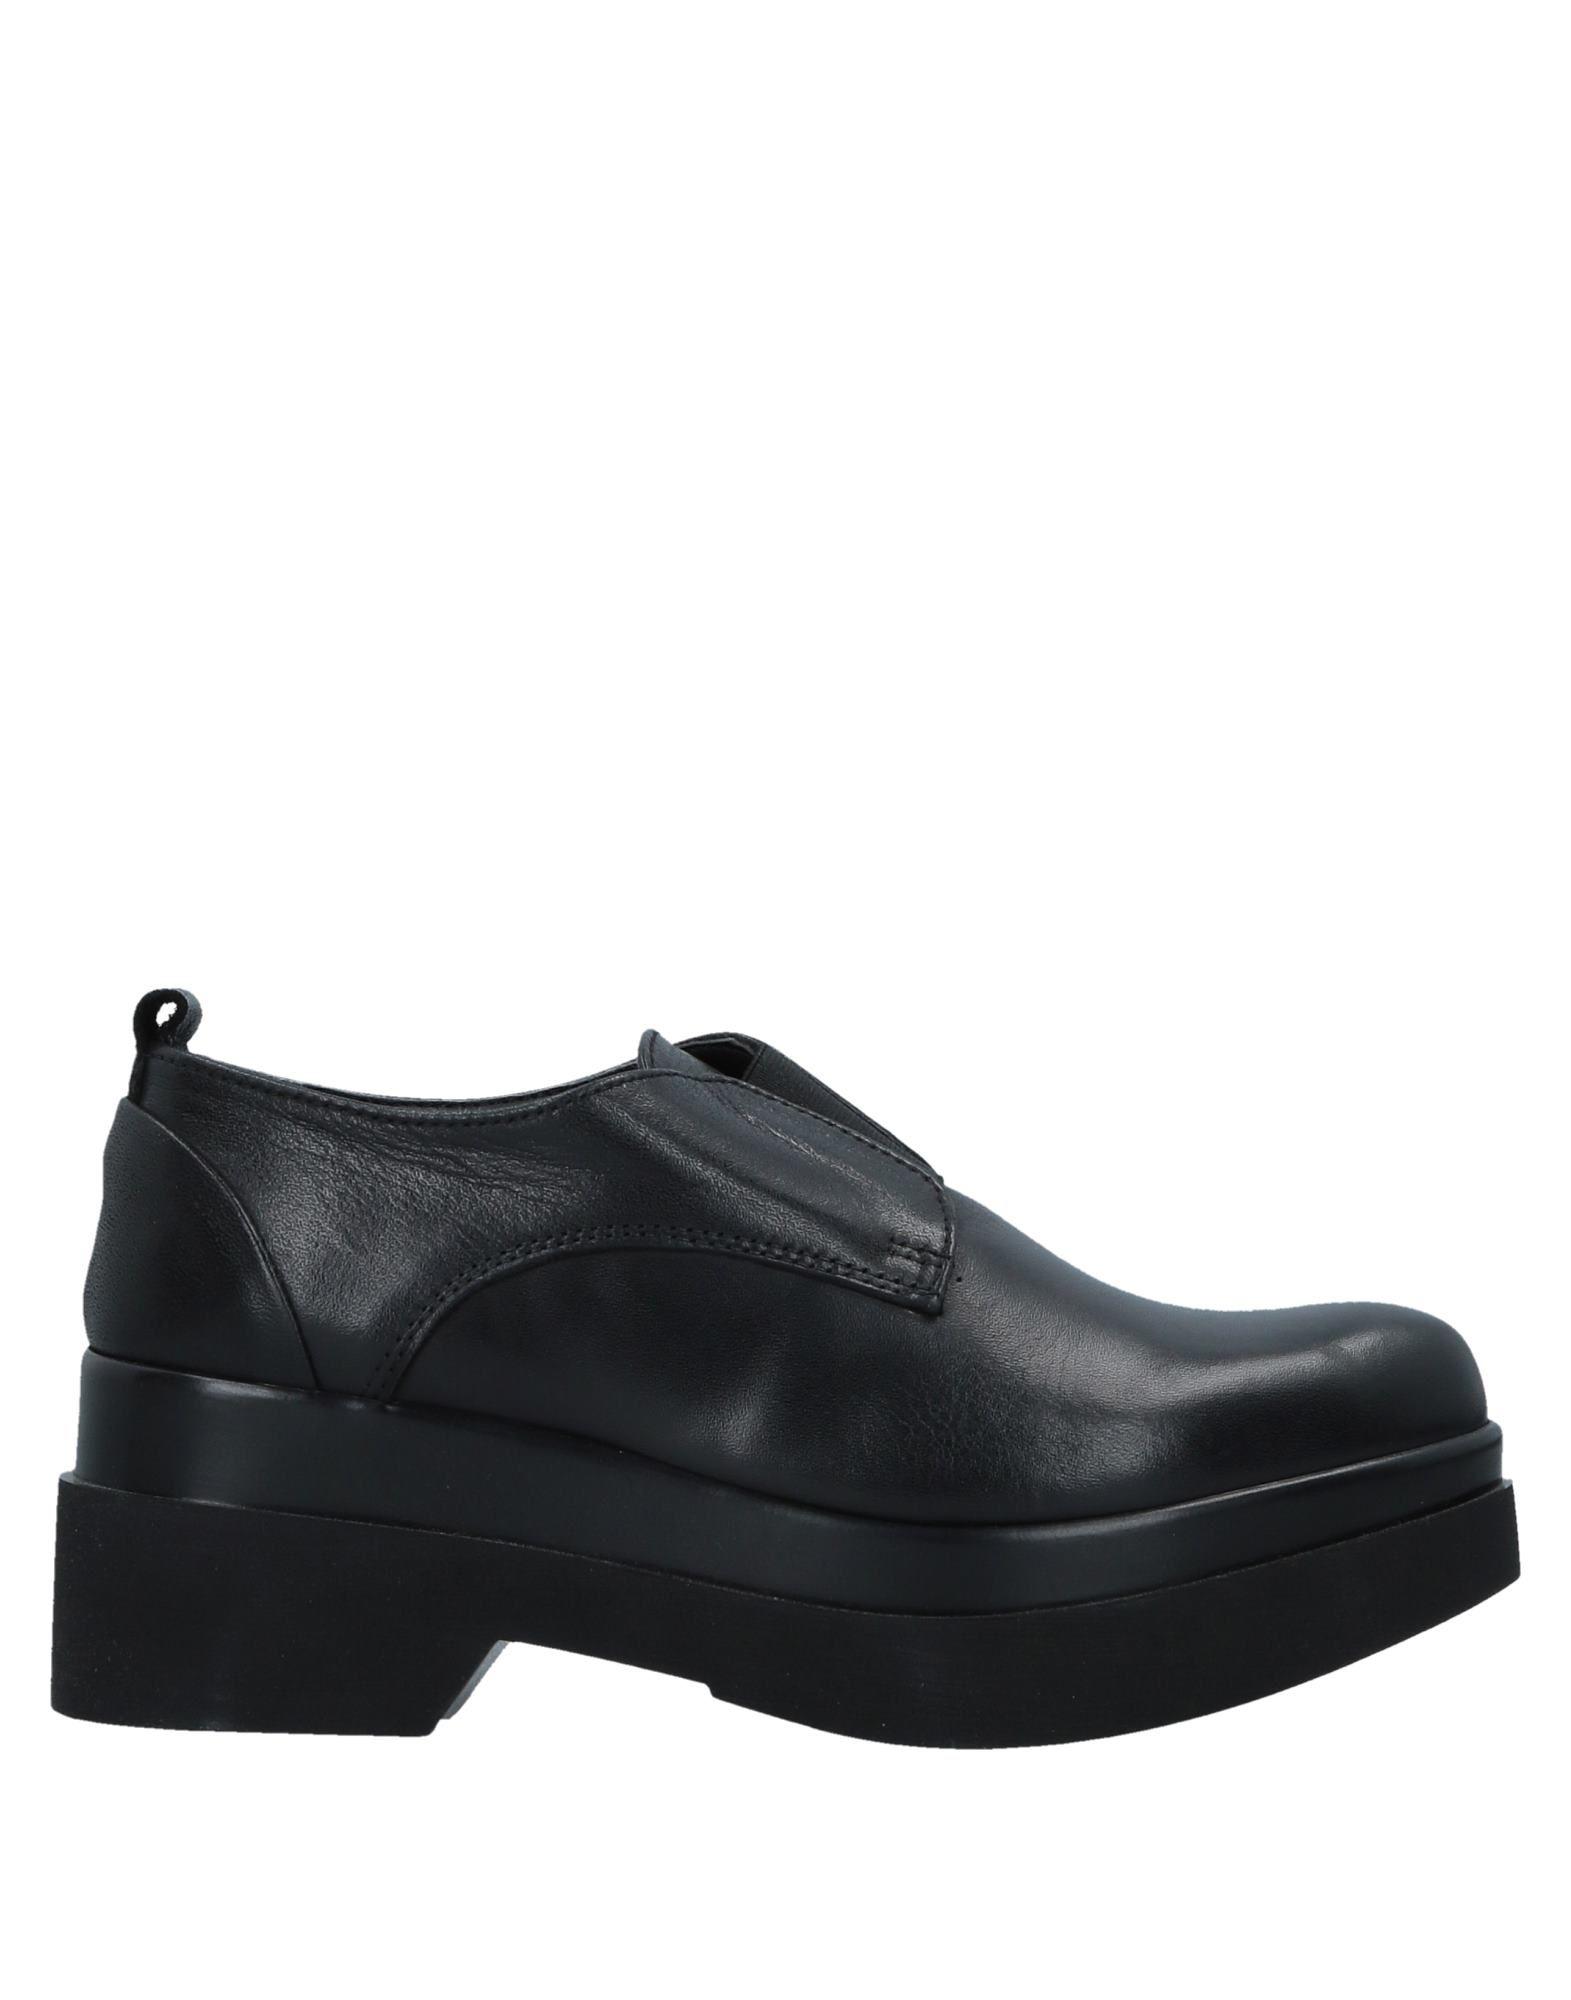 Brawn's Mokassins Damen  11529170XJ Gute Qualität beliebte Schuhe